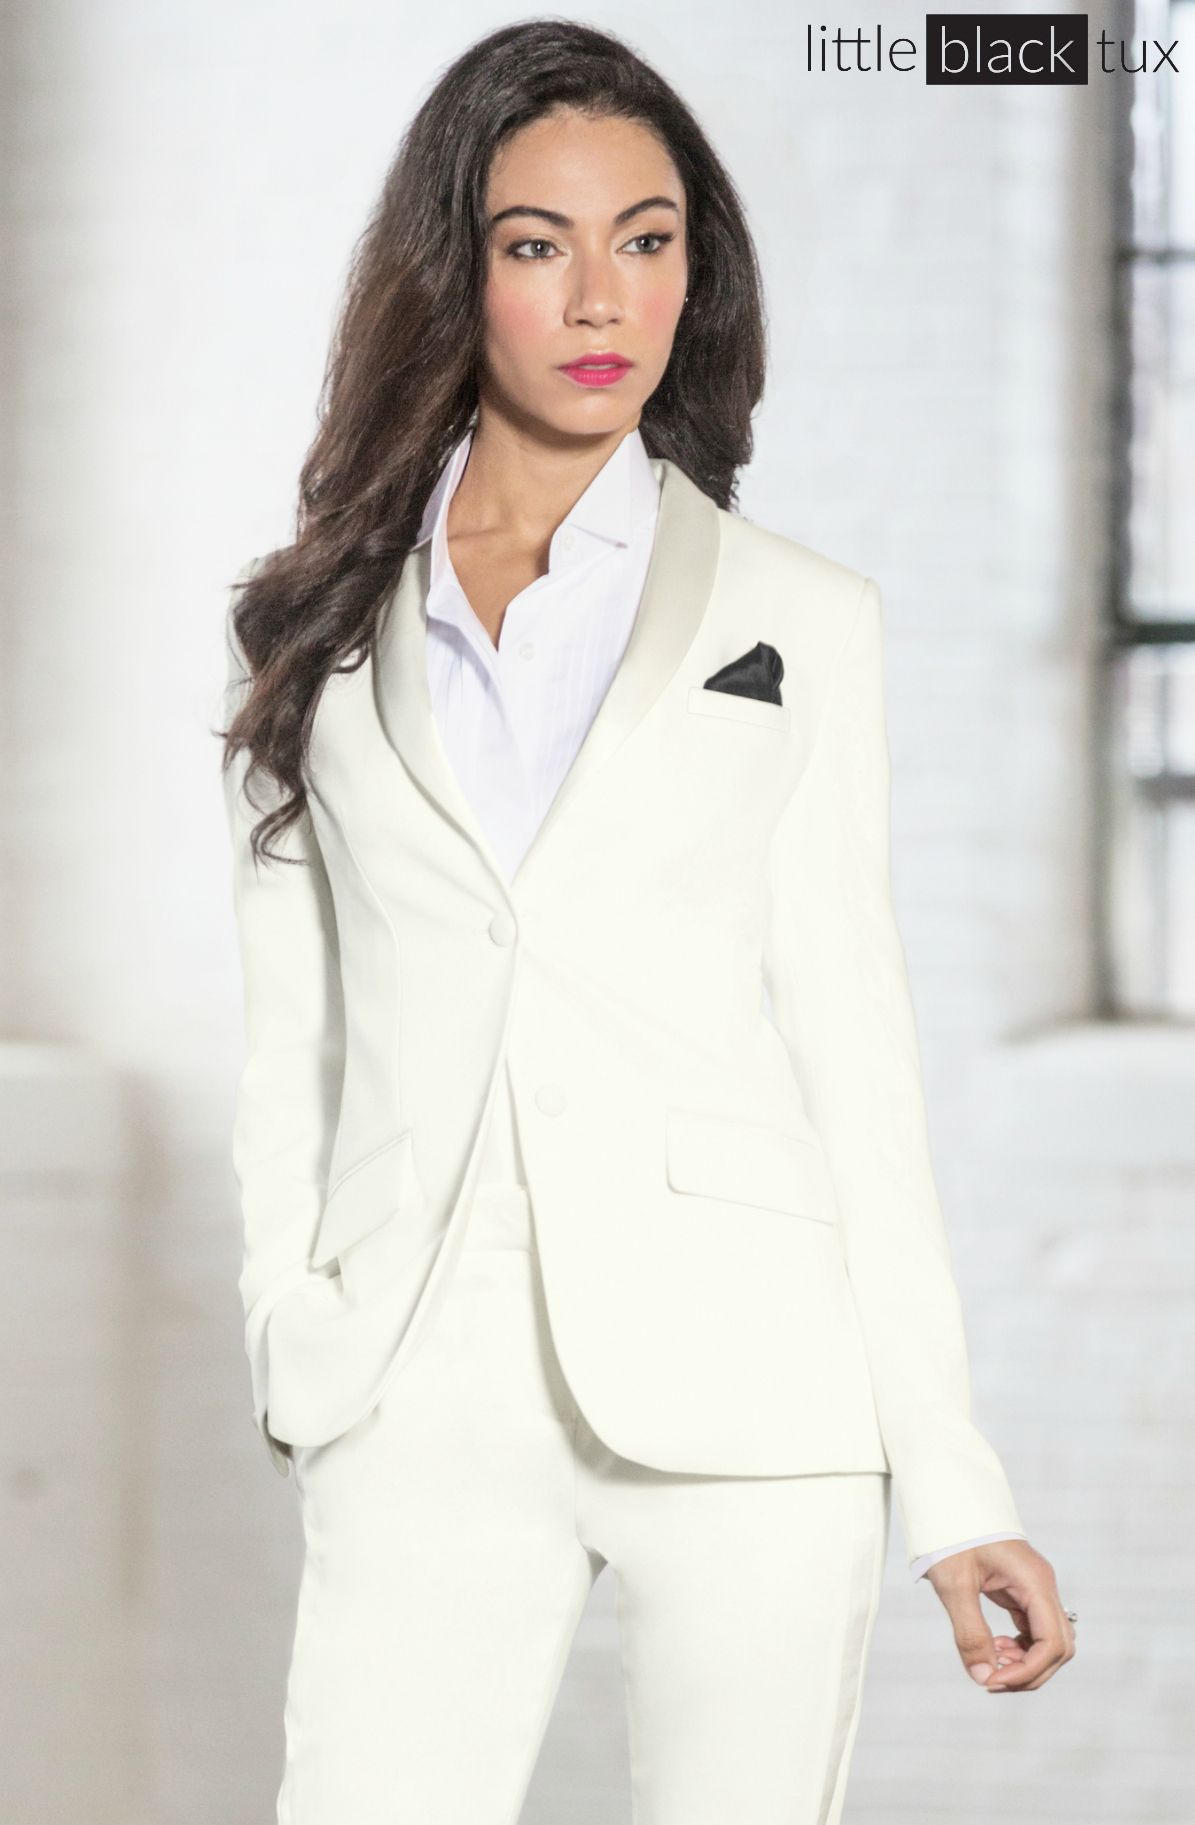 Women S Ivory Diamond White Tuxedo Ladytux Shawl Collar Slim Fit Belt Loops Satin Lapel Female Tuxedo Tuxedo Women Tuxedo Women Suits Bridesmaid Suits [ 1825 x 1195 Pixel ]